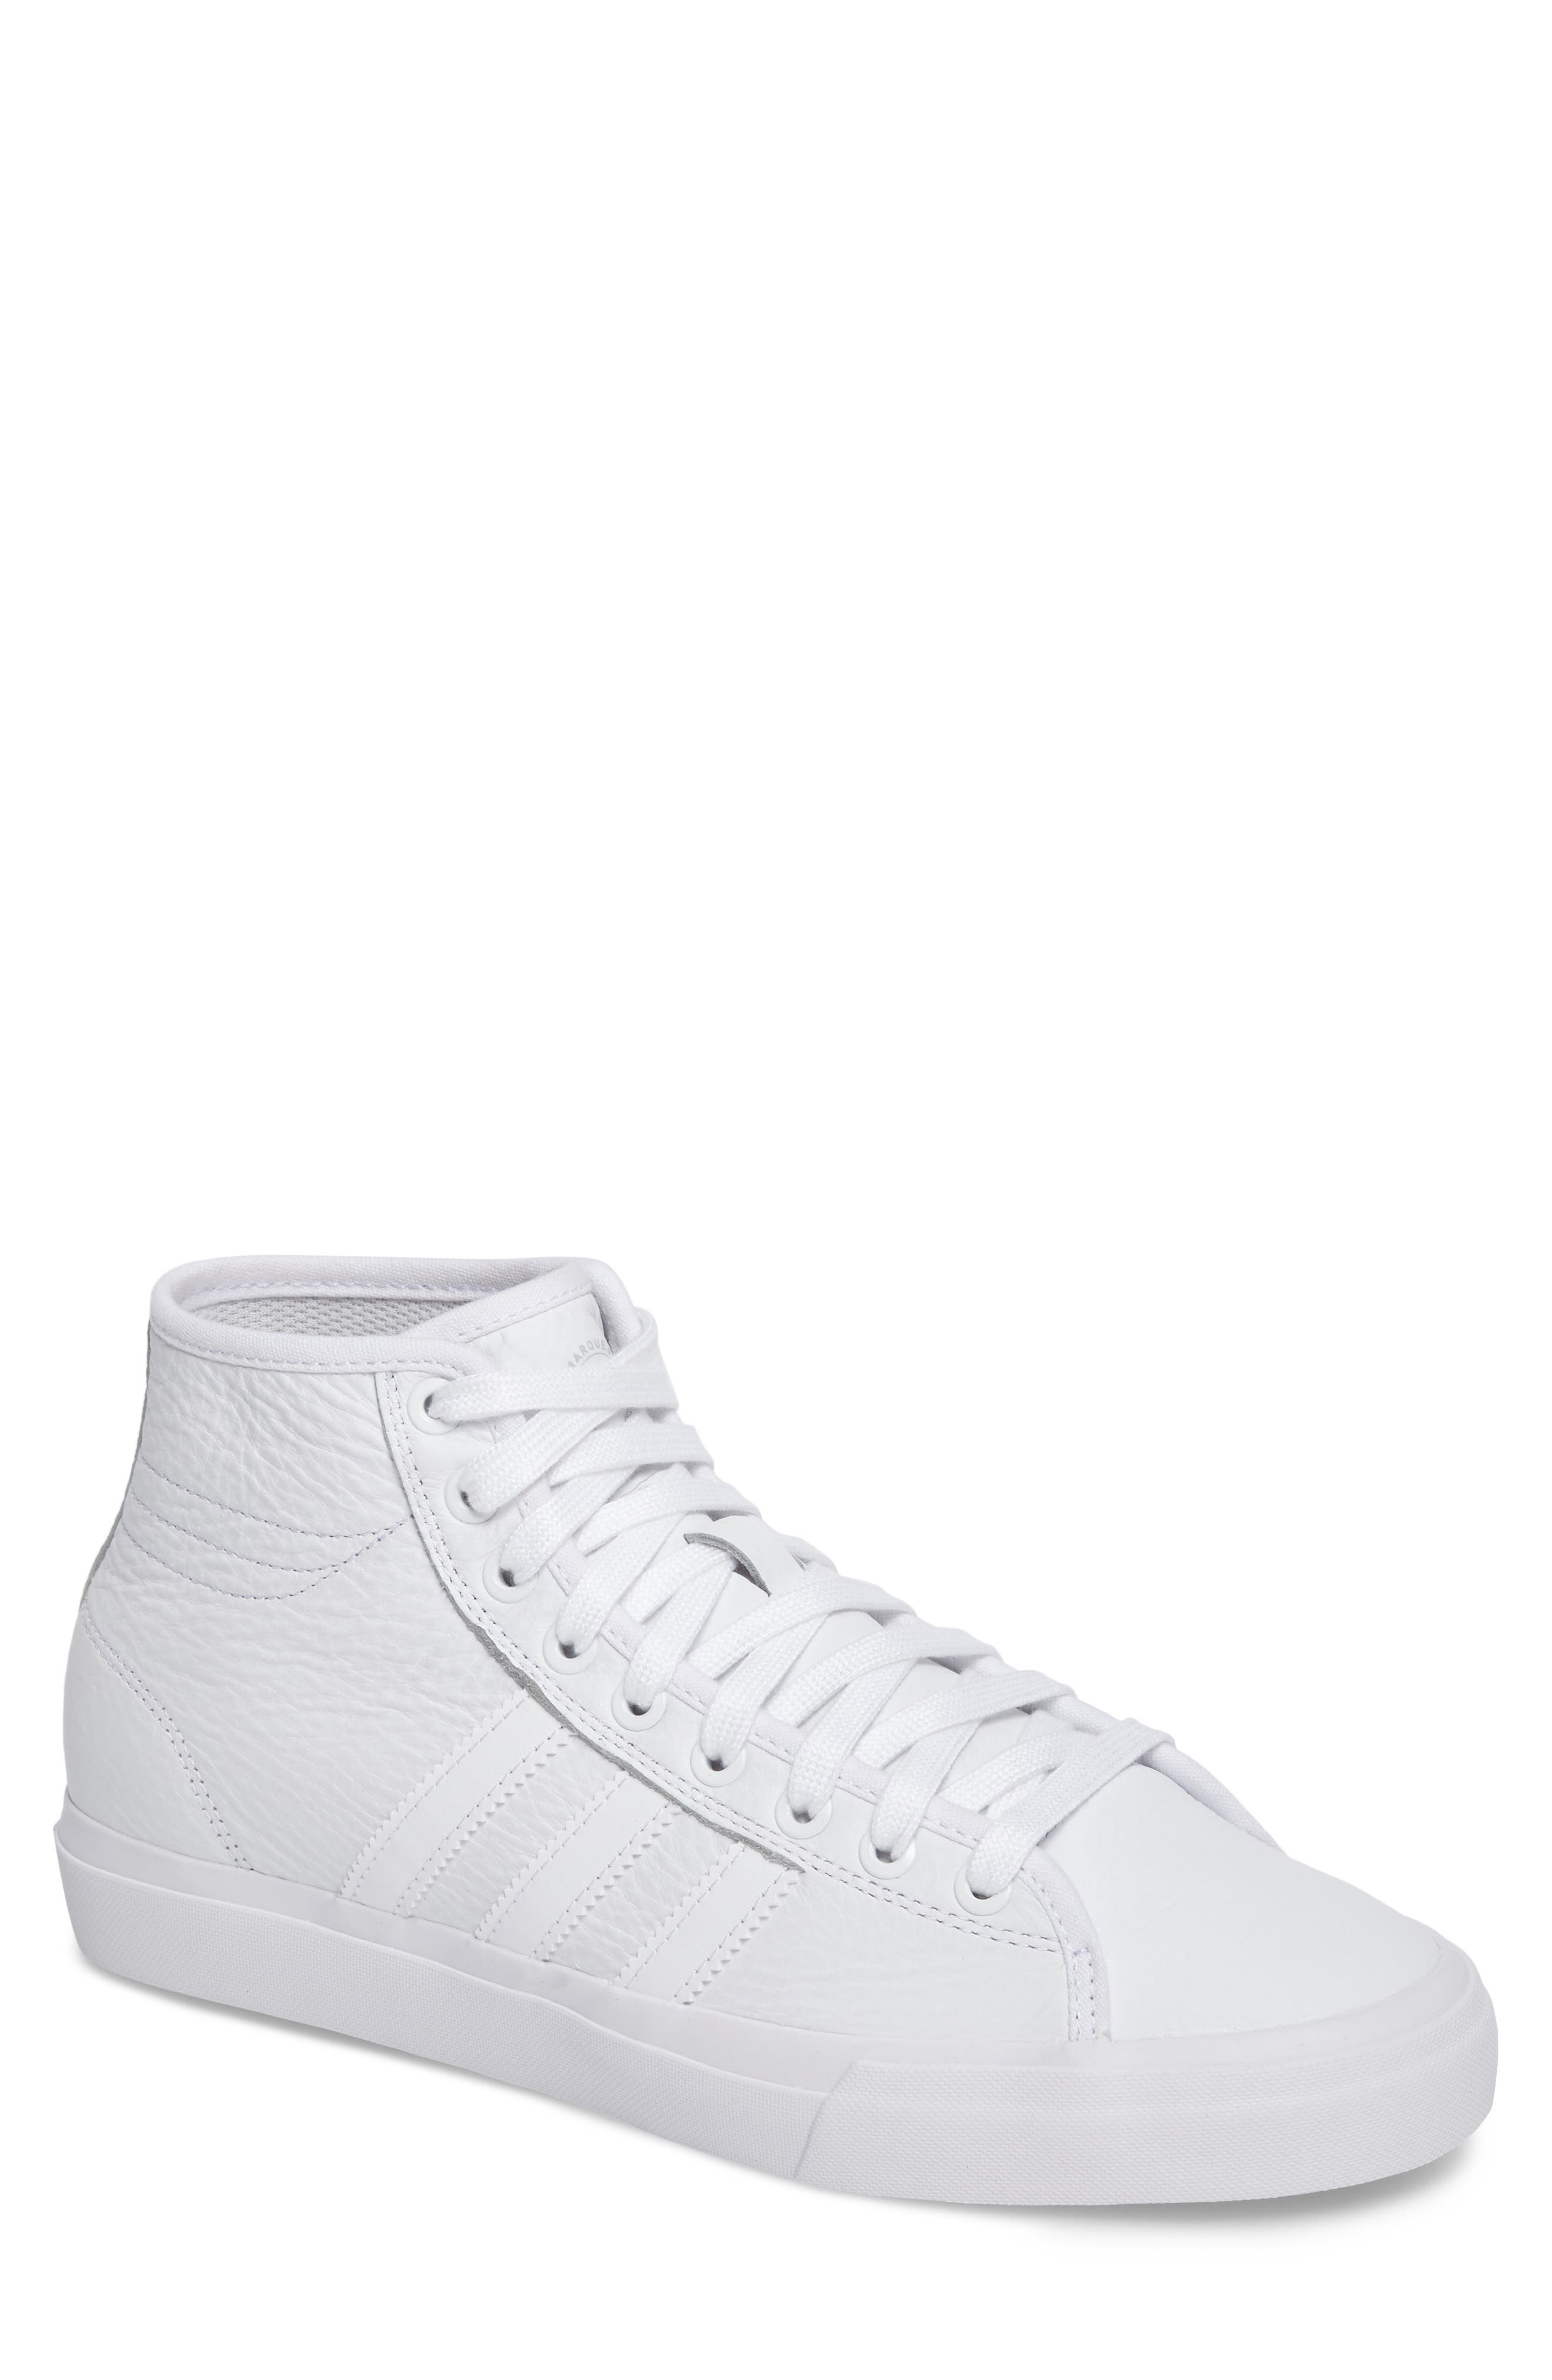 Matchcourt High Top Sneaker,                         Main,                         color, White/ White/ White